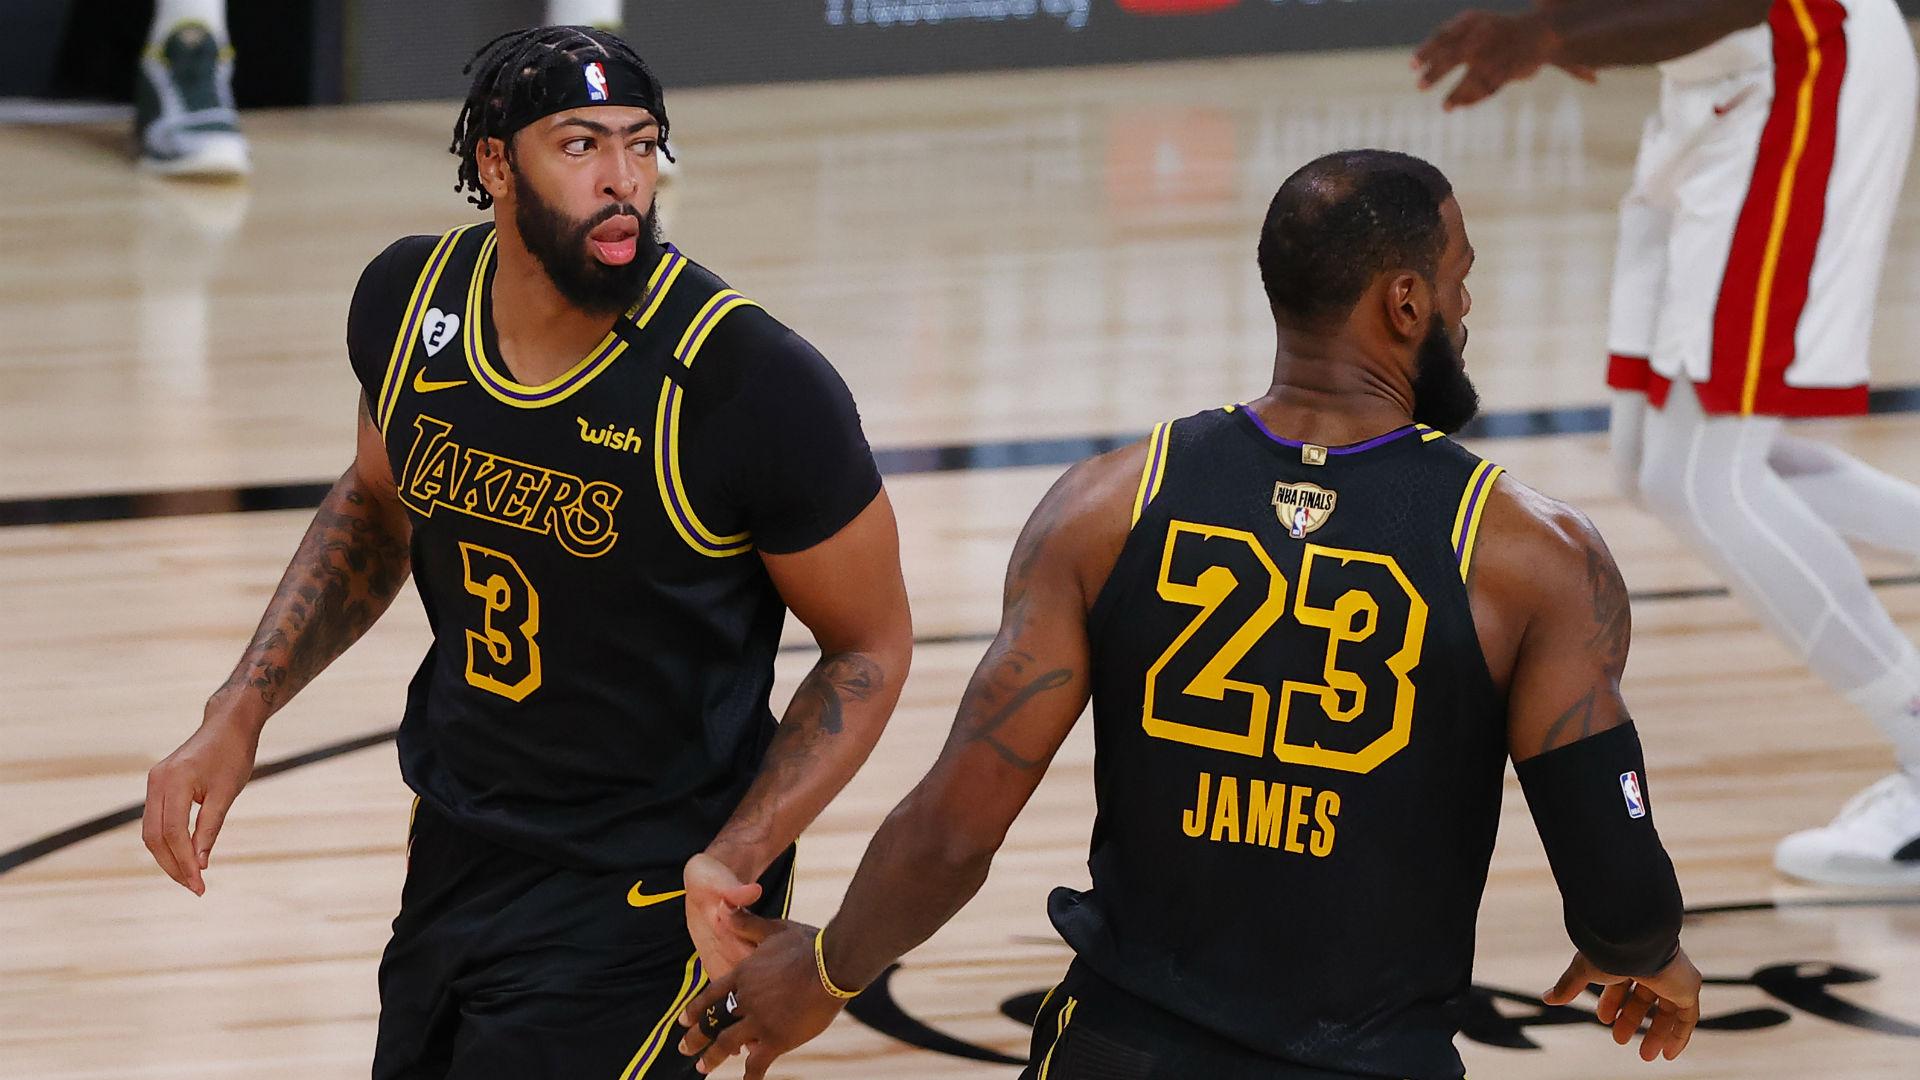 Lakers vs. Heat score, results: LeBron James, Anthony Davis power LA past Miami in Game 2 1